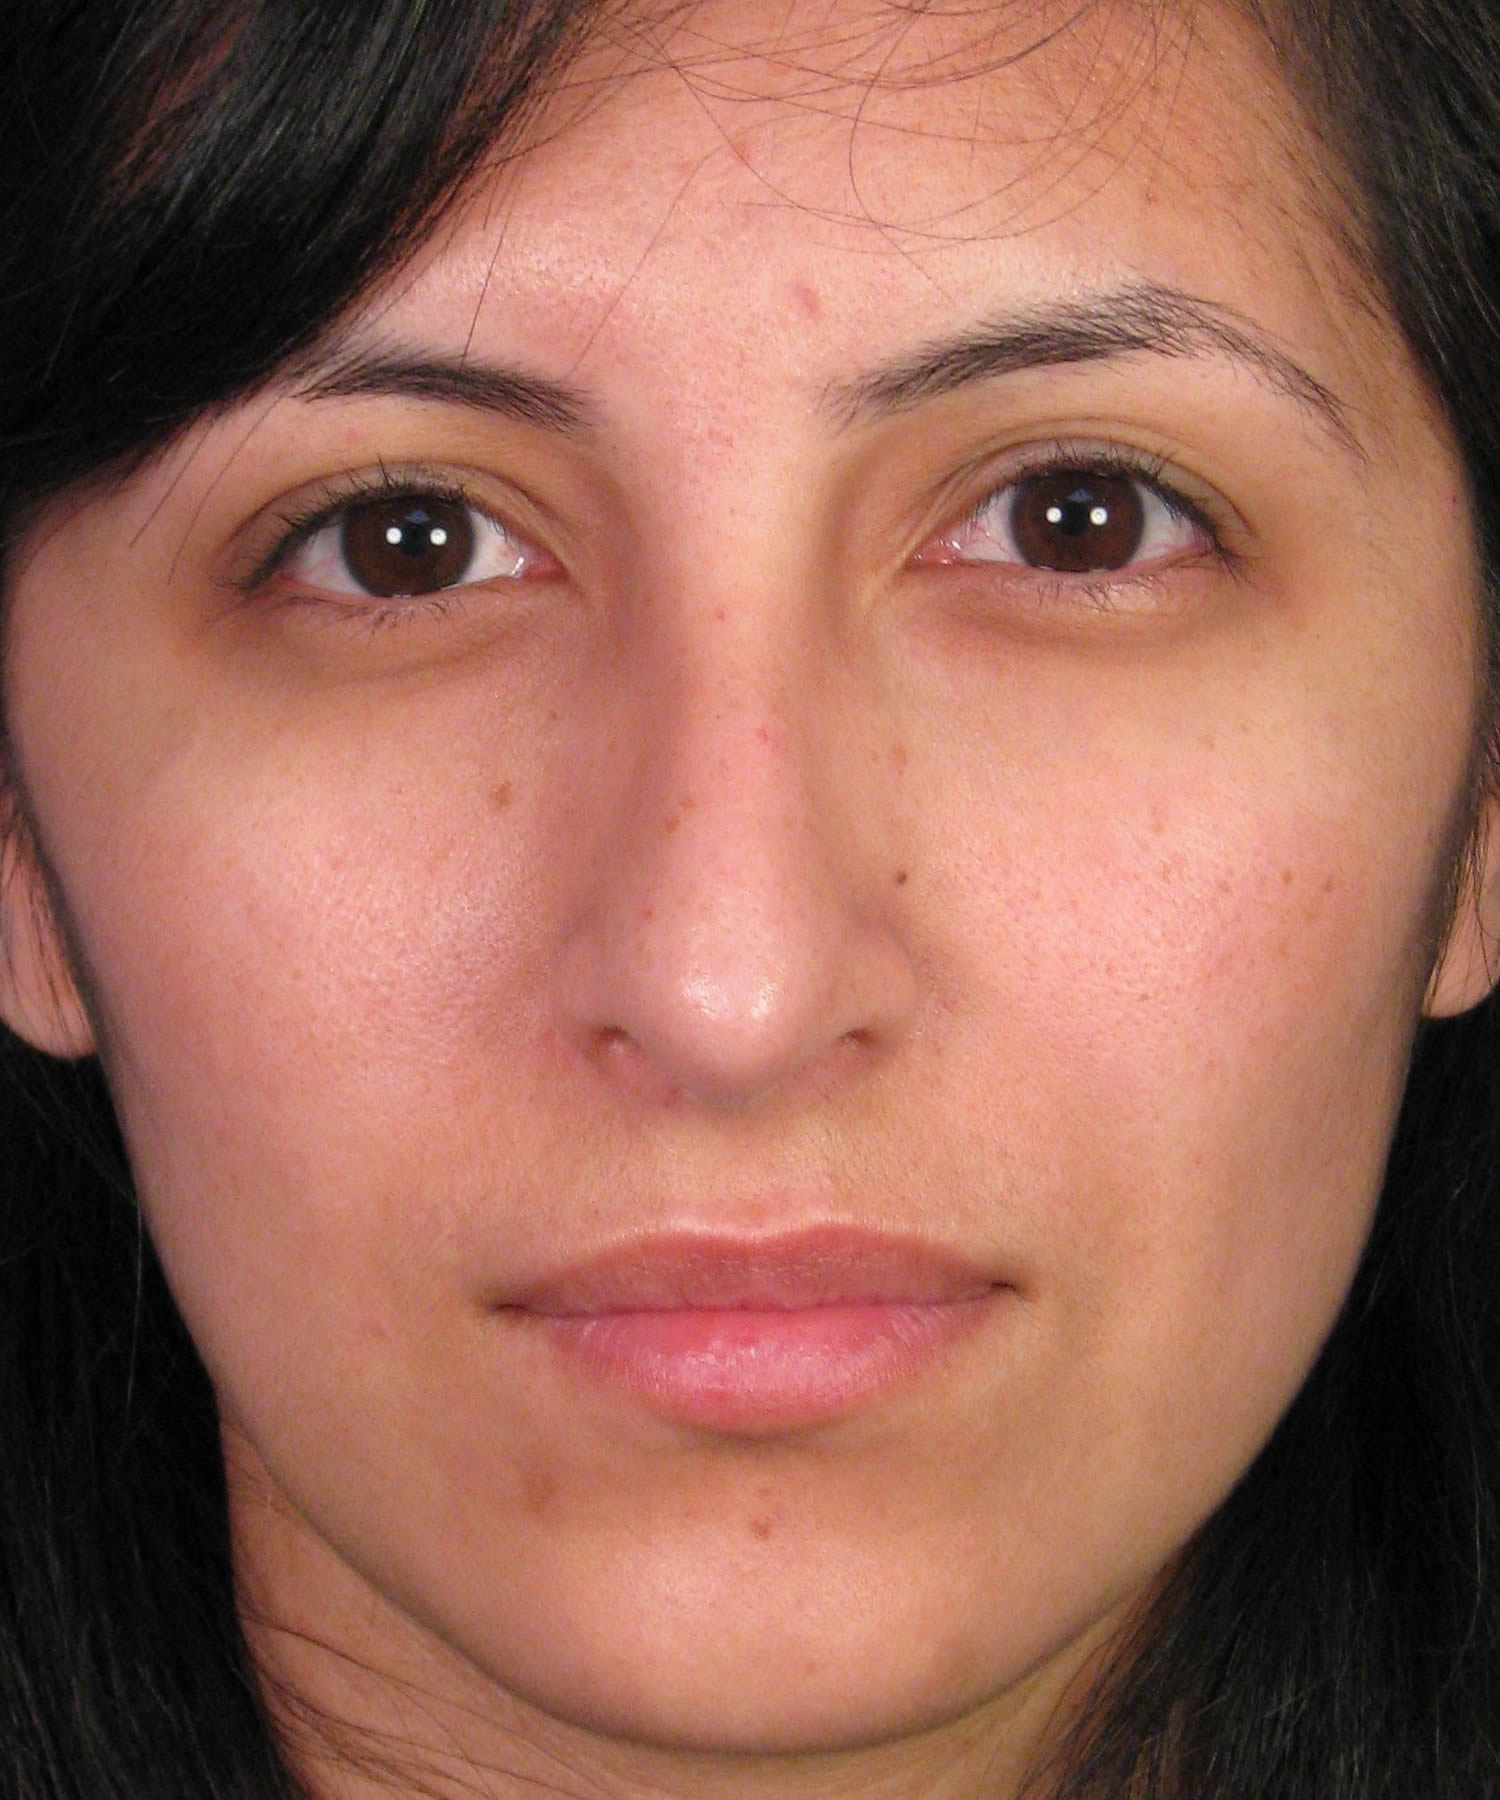 Rhinoplasty Correction – Crooked Nose Deformity